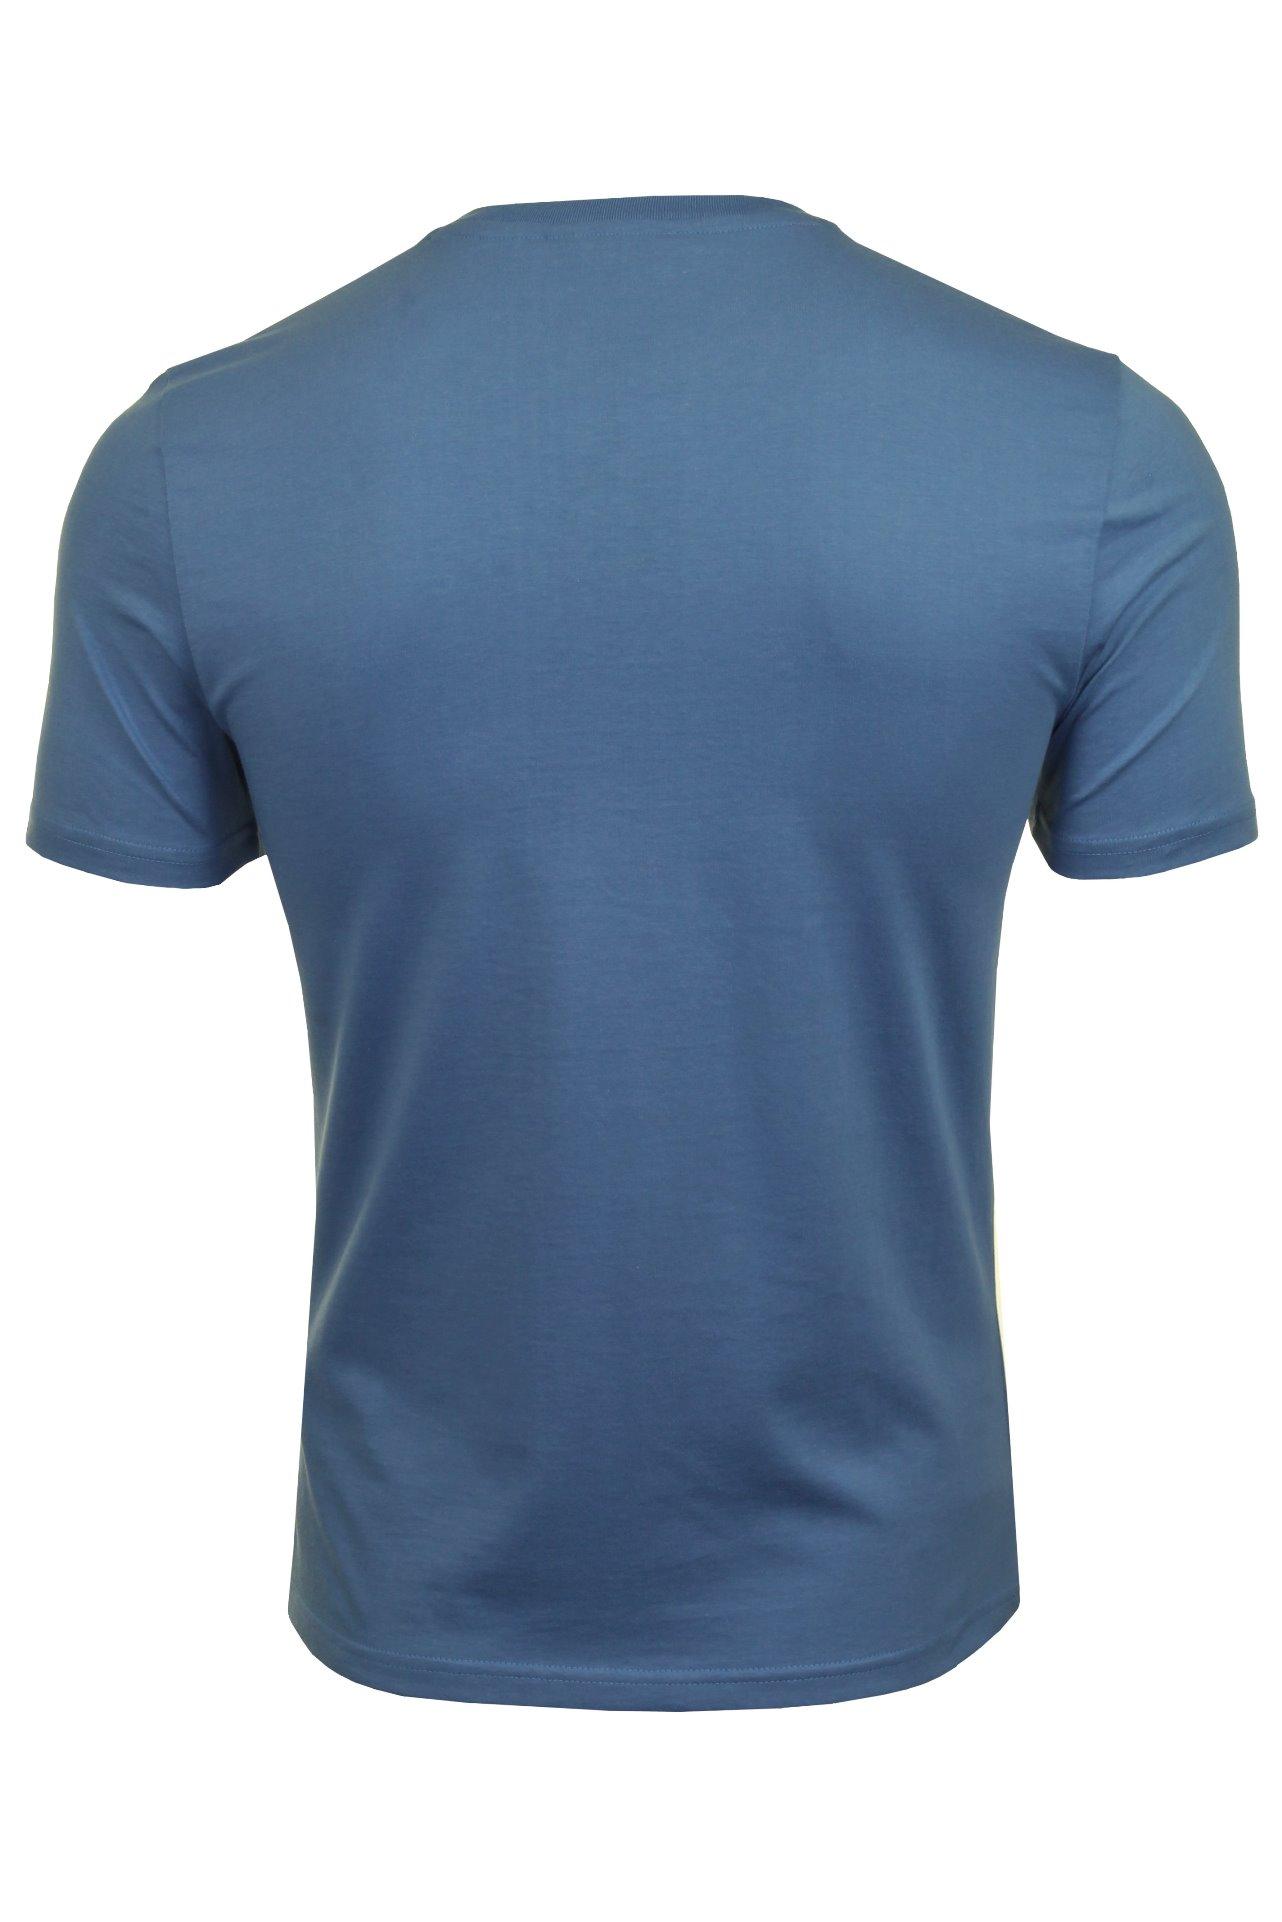 Mens-Classic-Spade-Pocket-T-Shirt-by-Ben-Sherman thumbnail 13